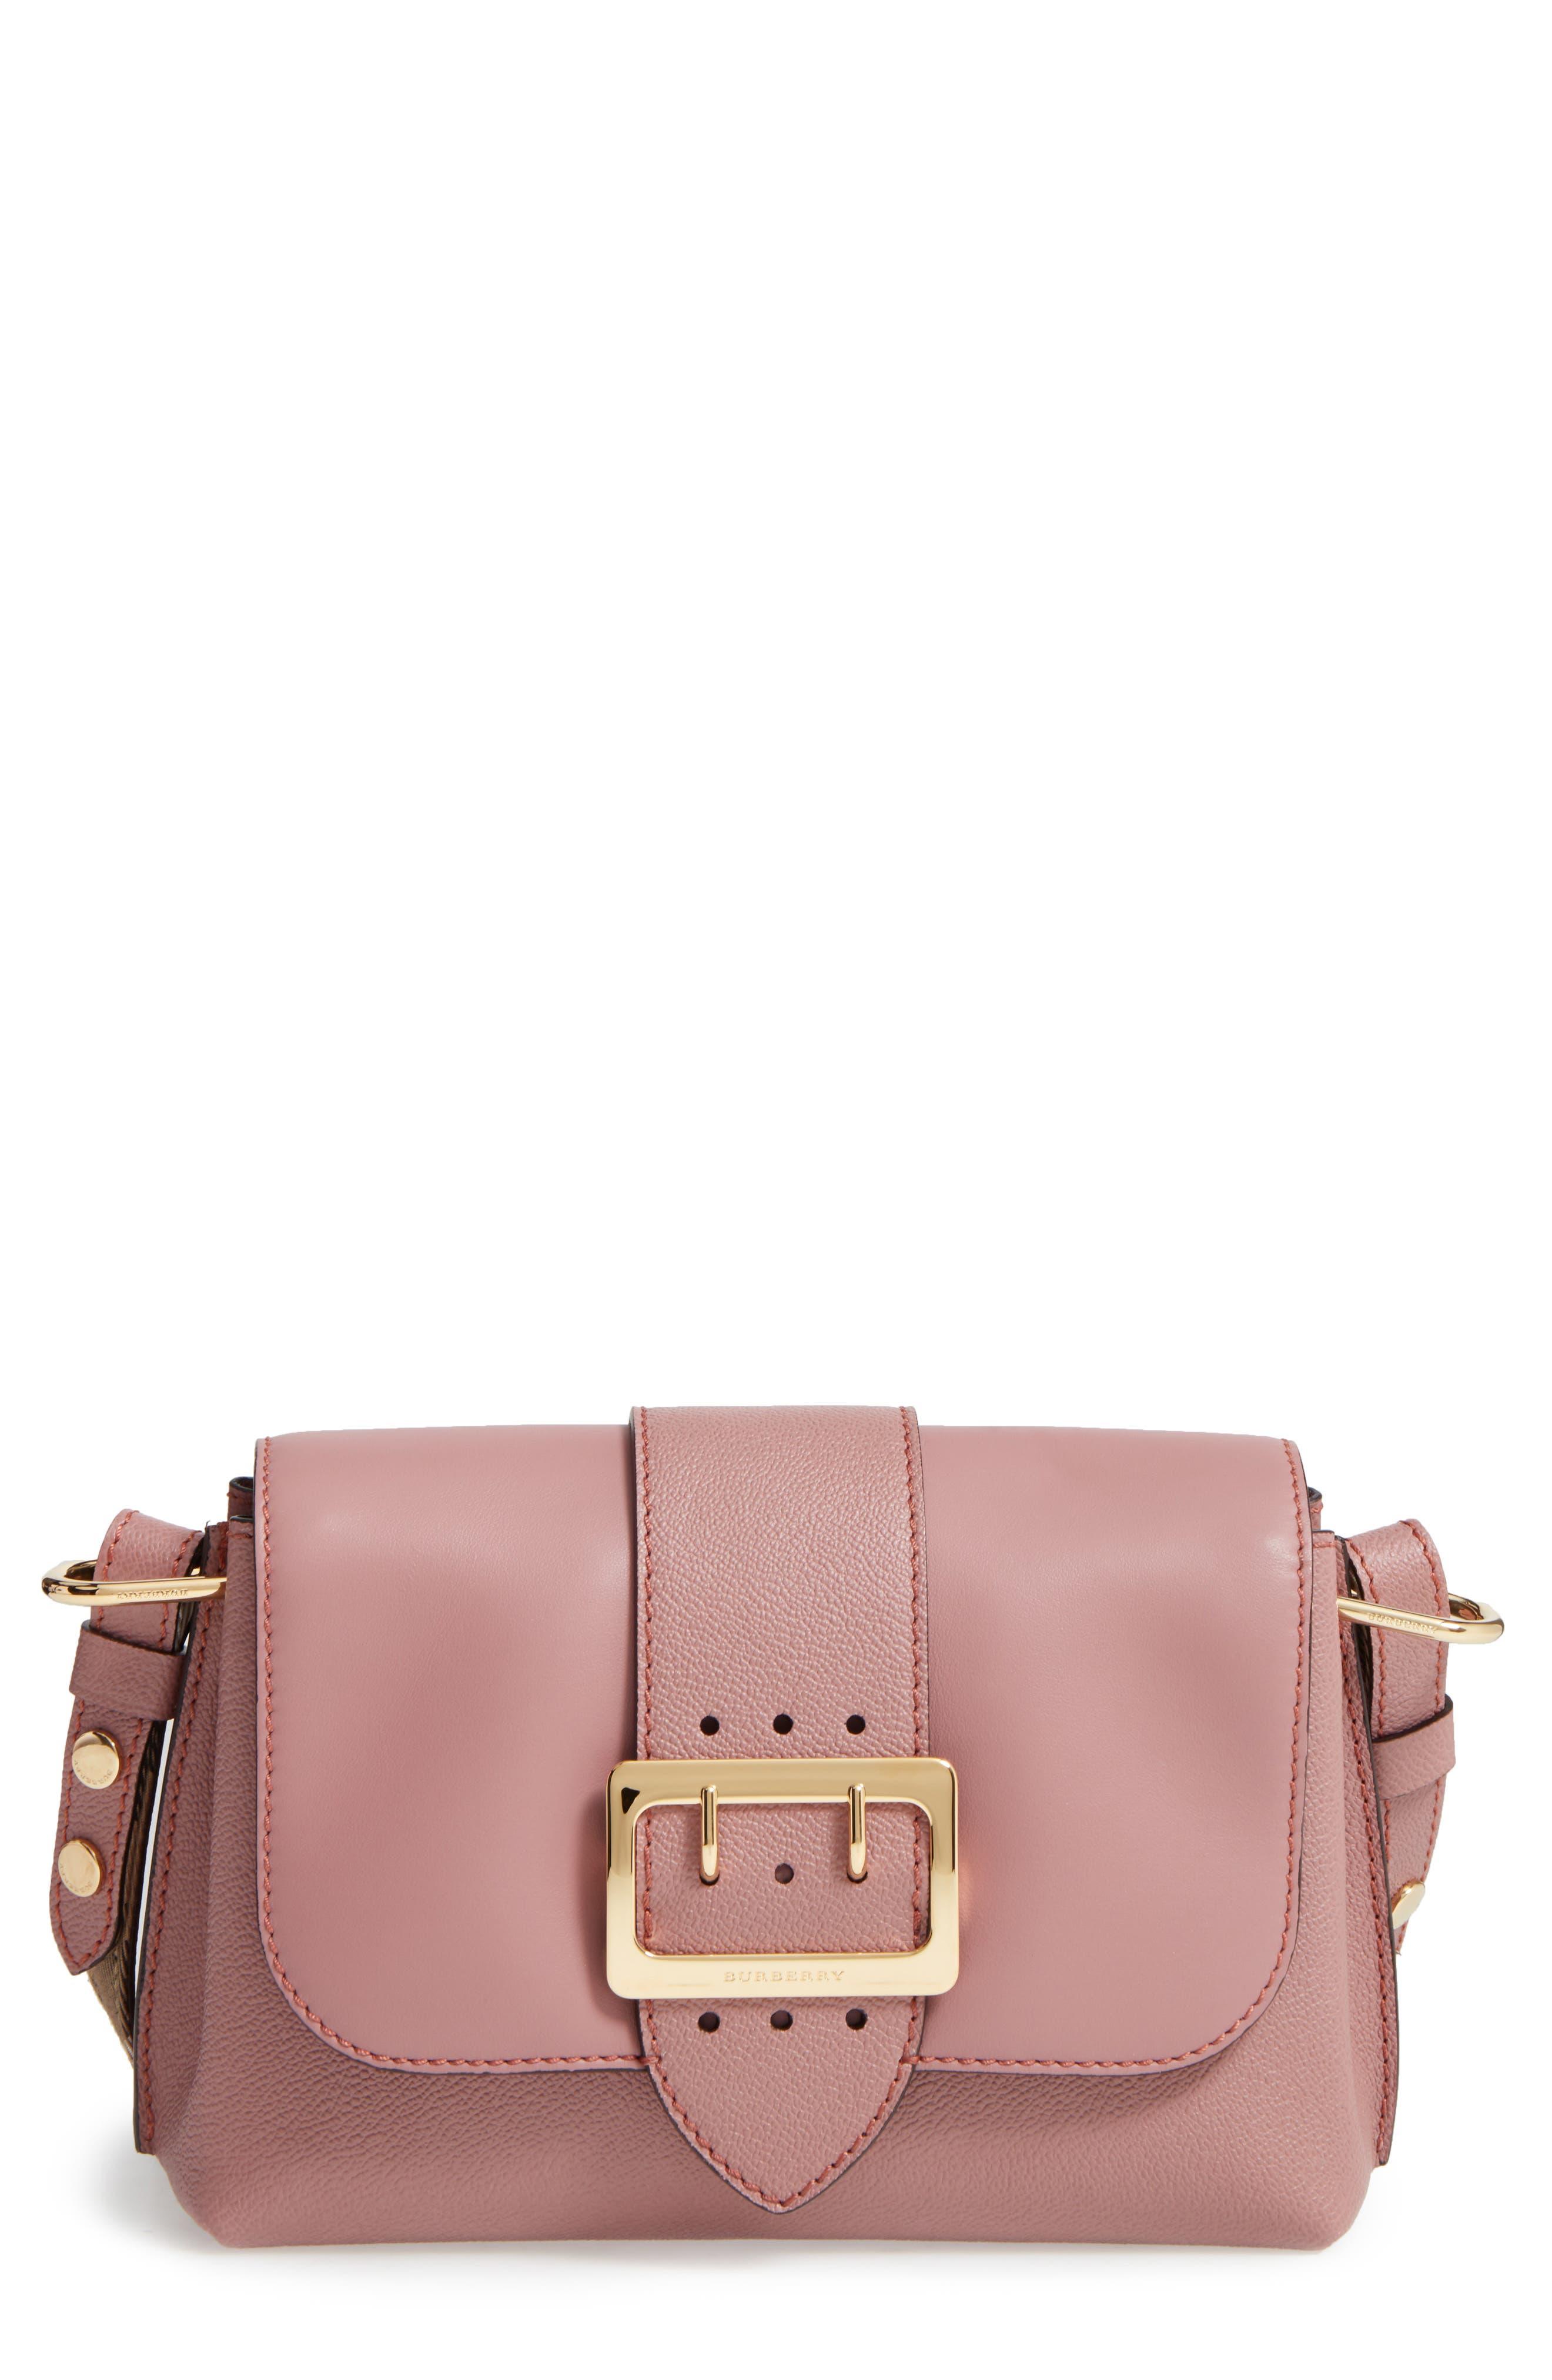 Alternate Image 1 Selected - Burberry Small Medley Leather Shoulder Bag